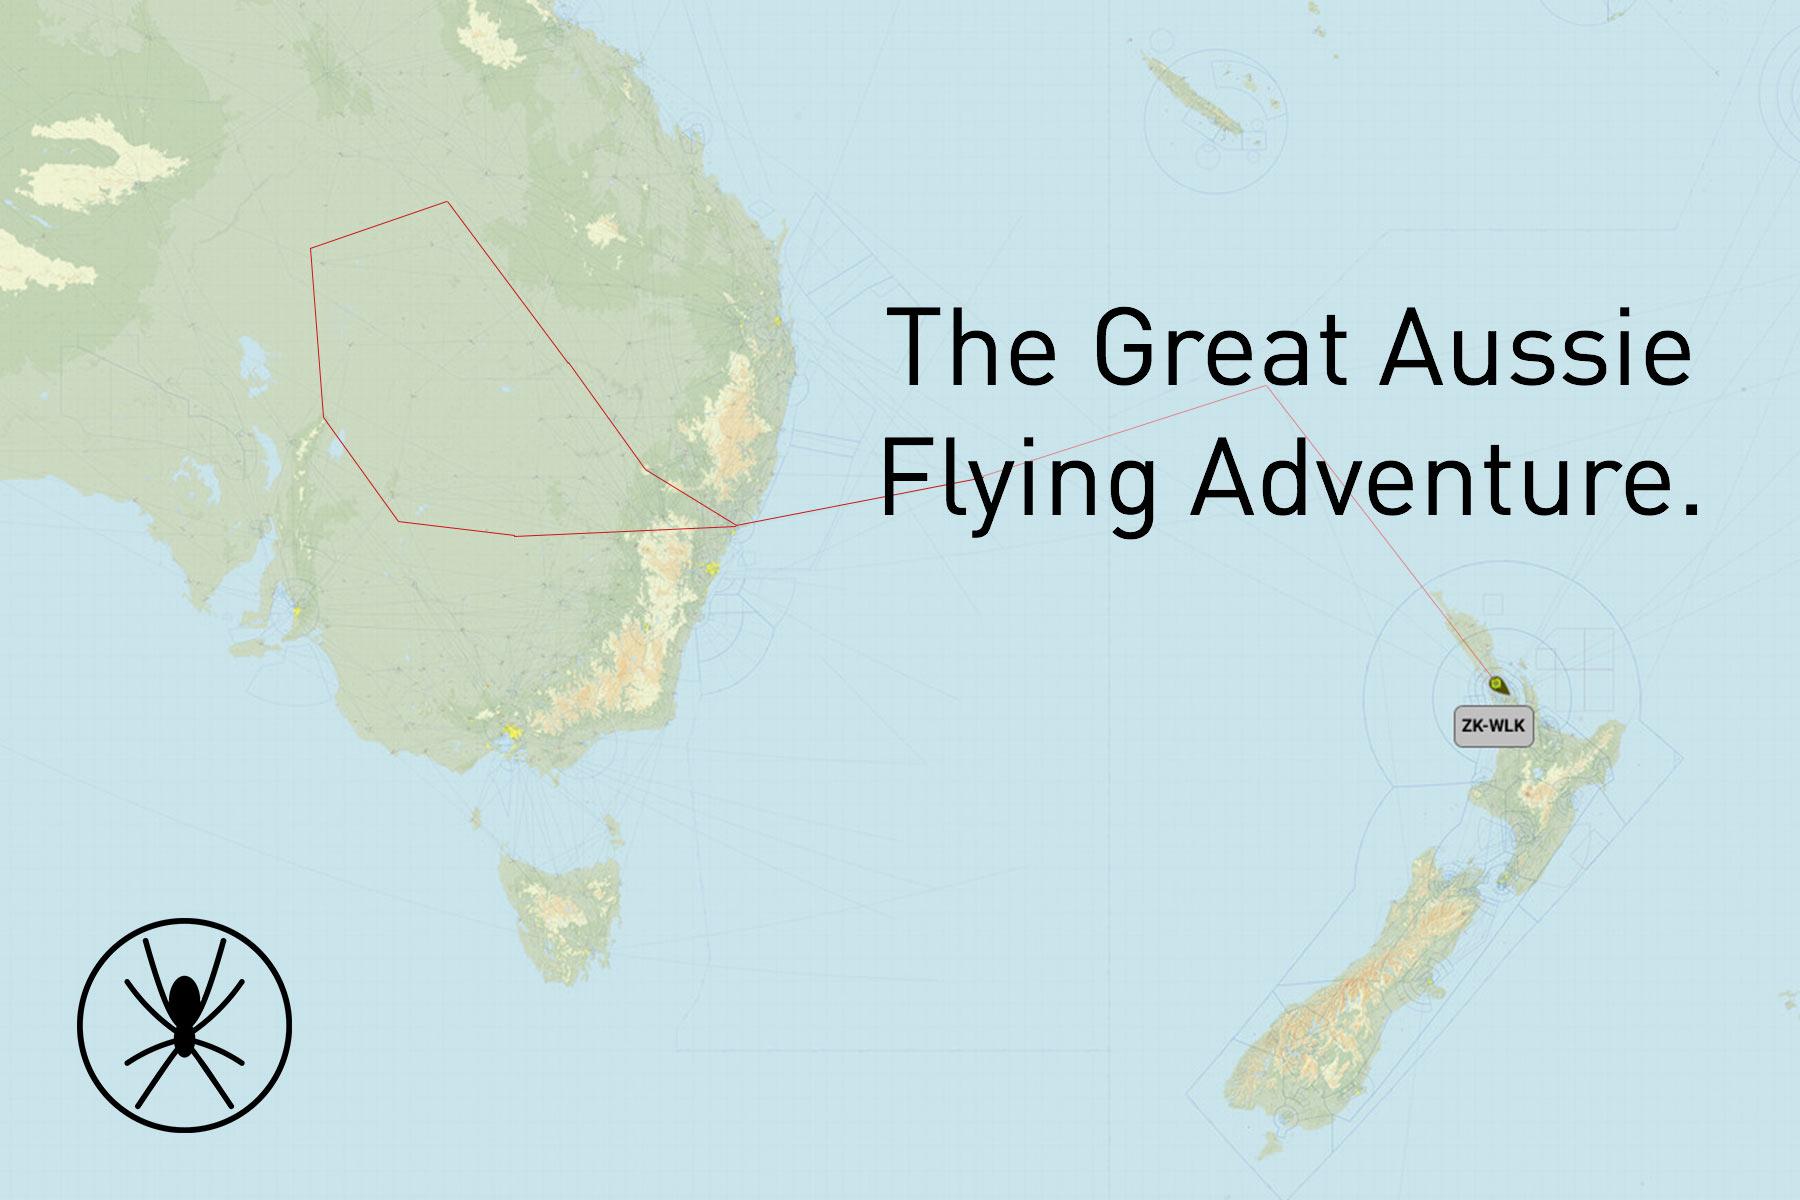 Kiwi Pilots Tackle Their Toughest Flight Yet